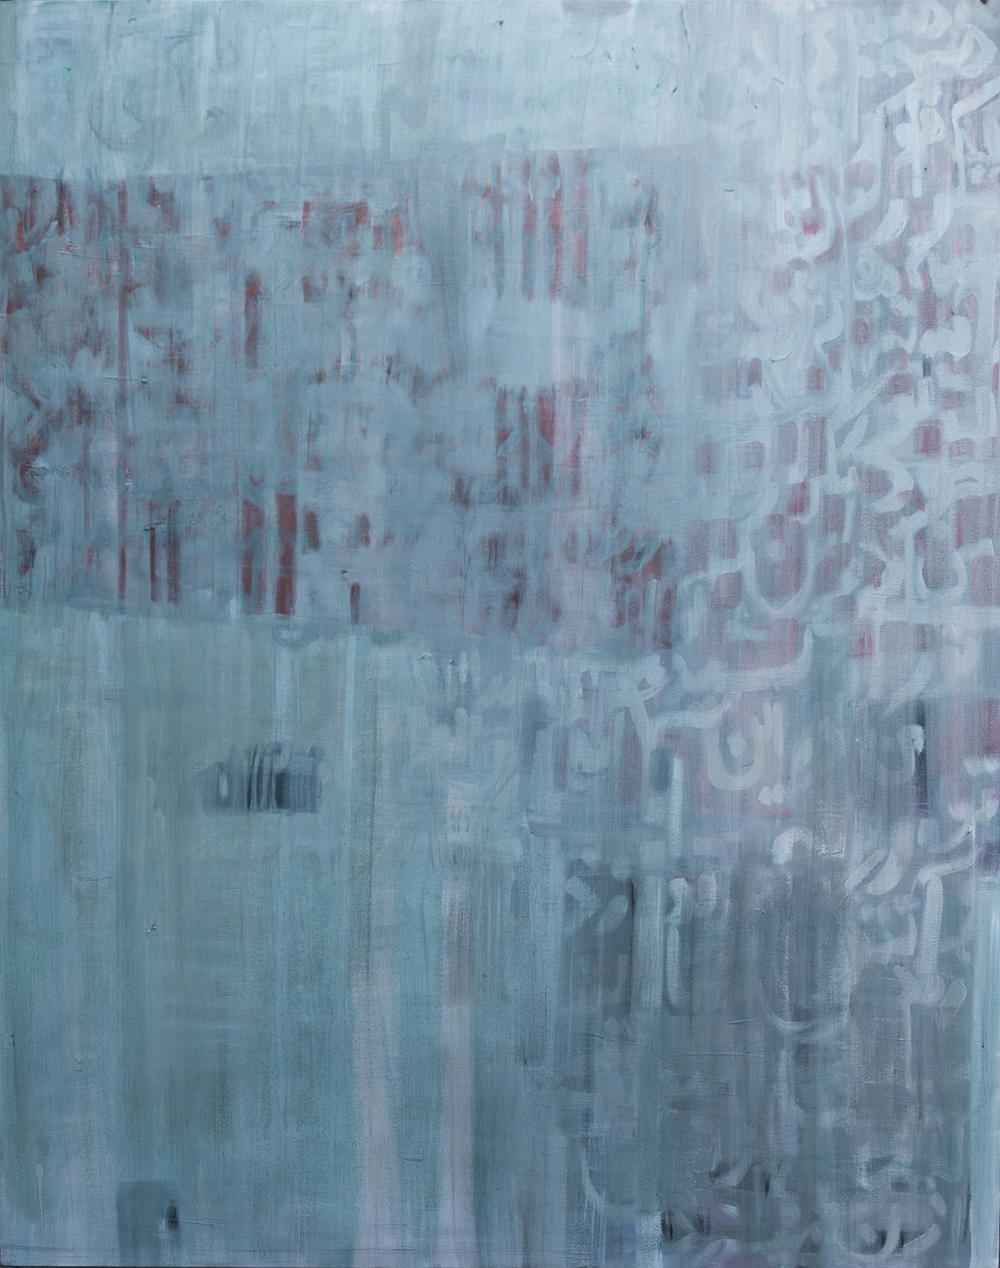 Blue Poem 150x120cm